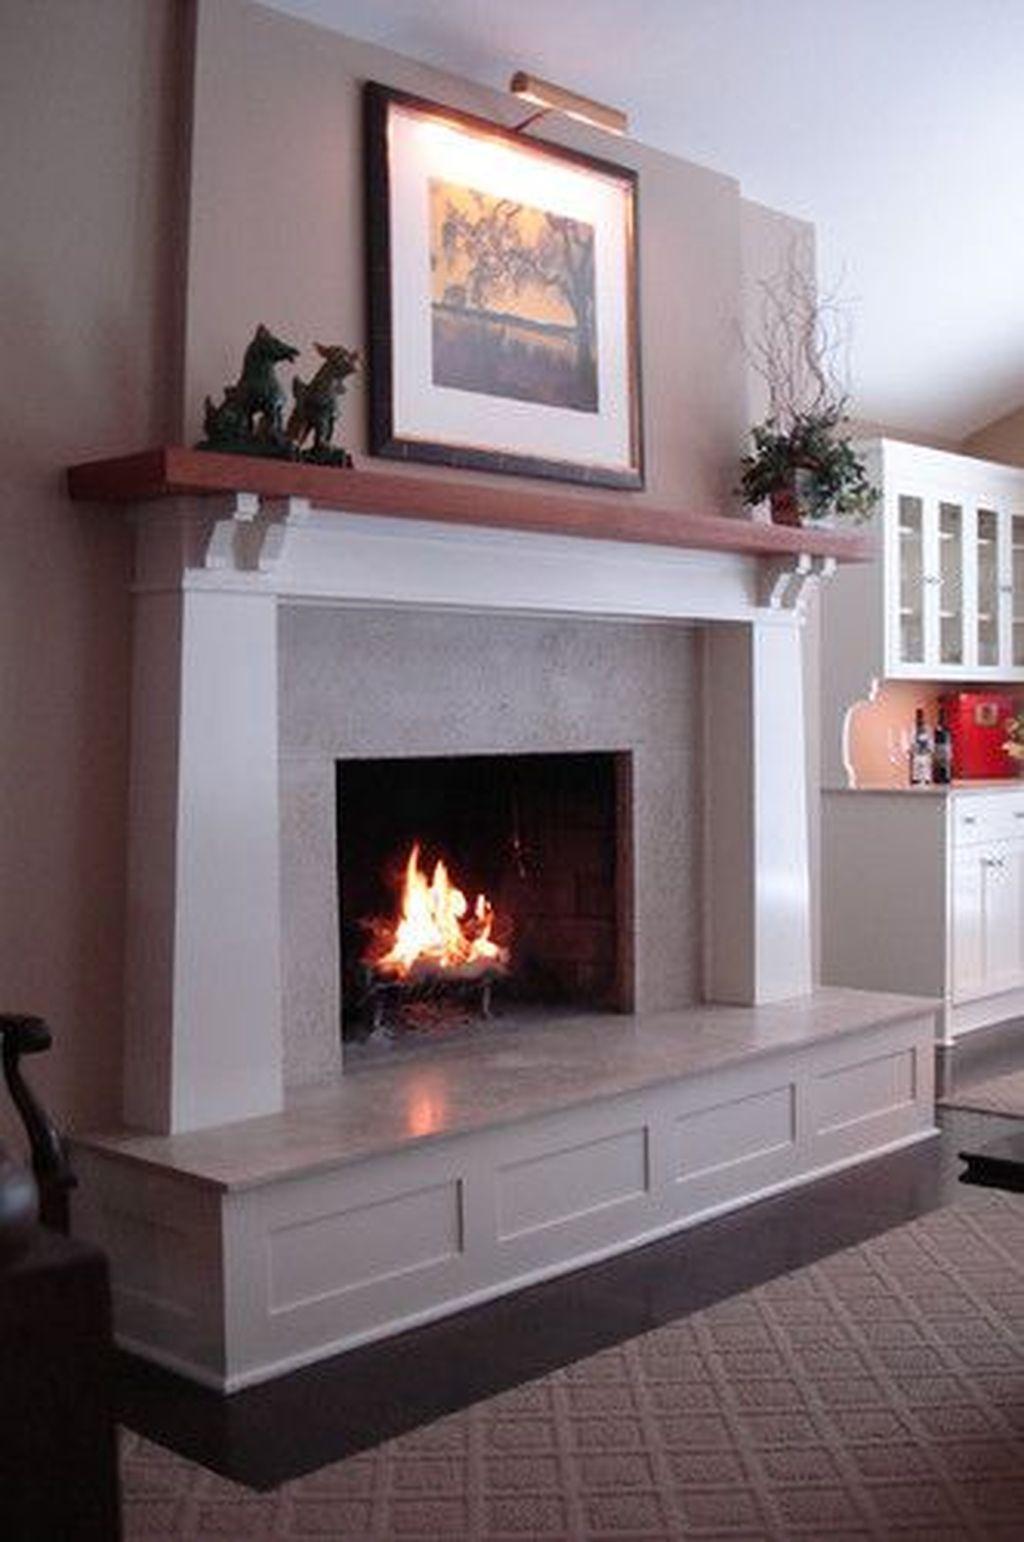 45 Best Fireplace Ideas With Unique Design Fireplace Design